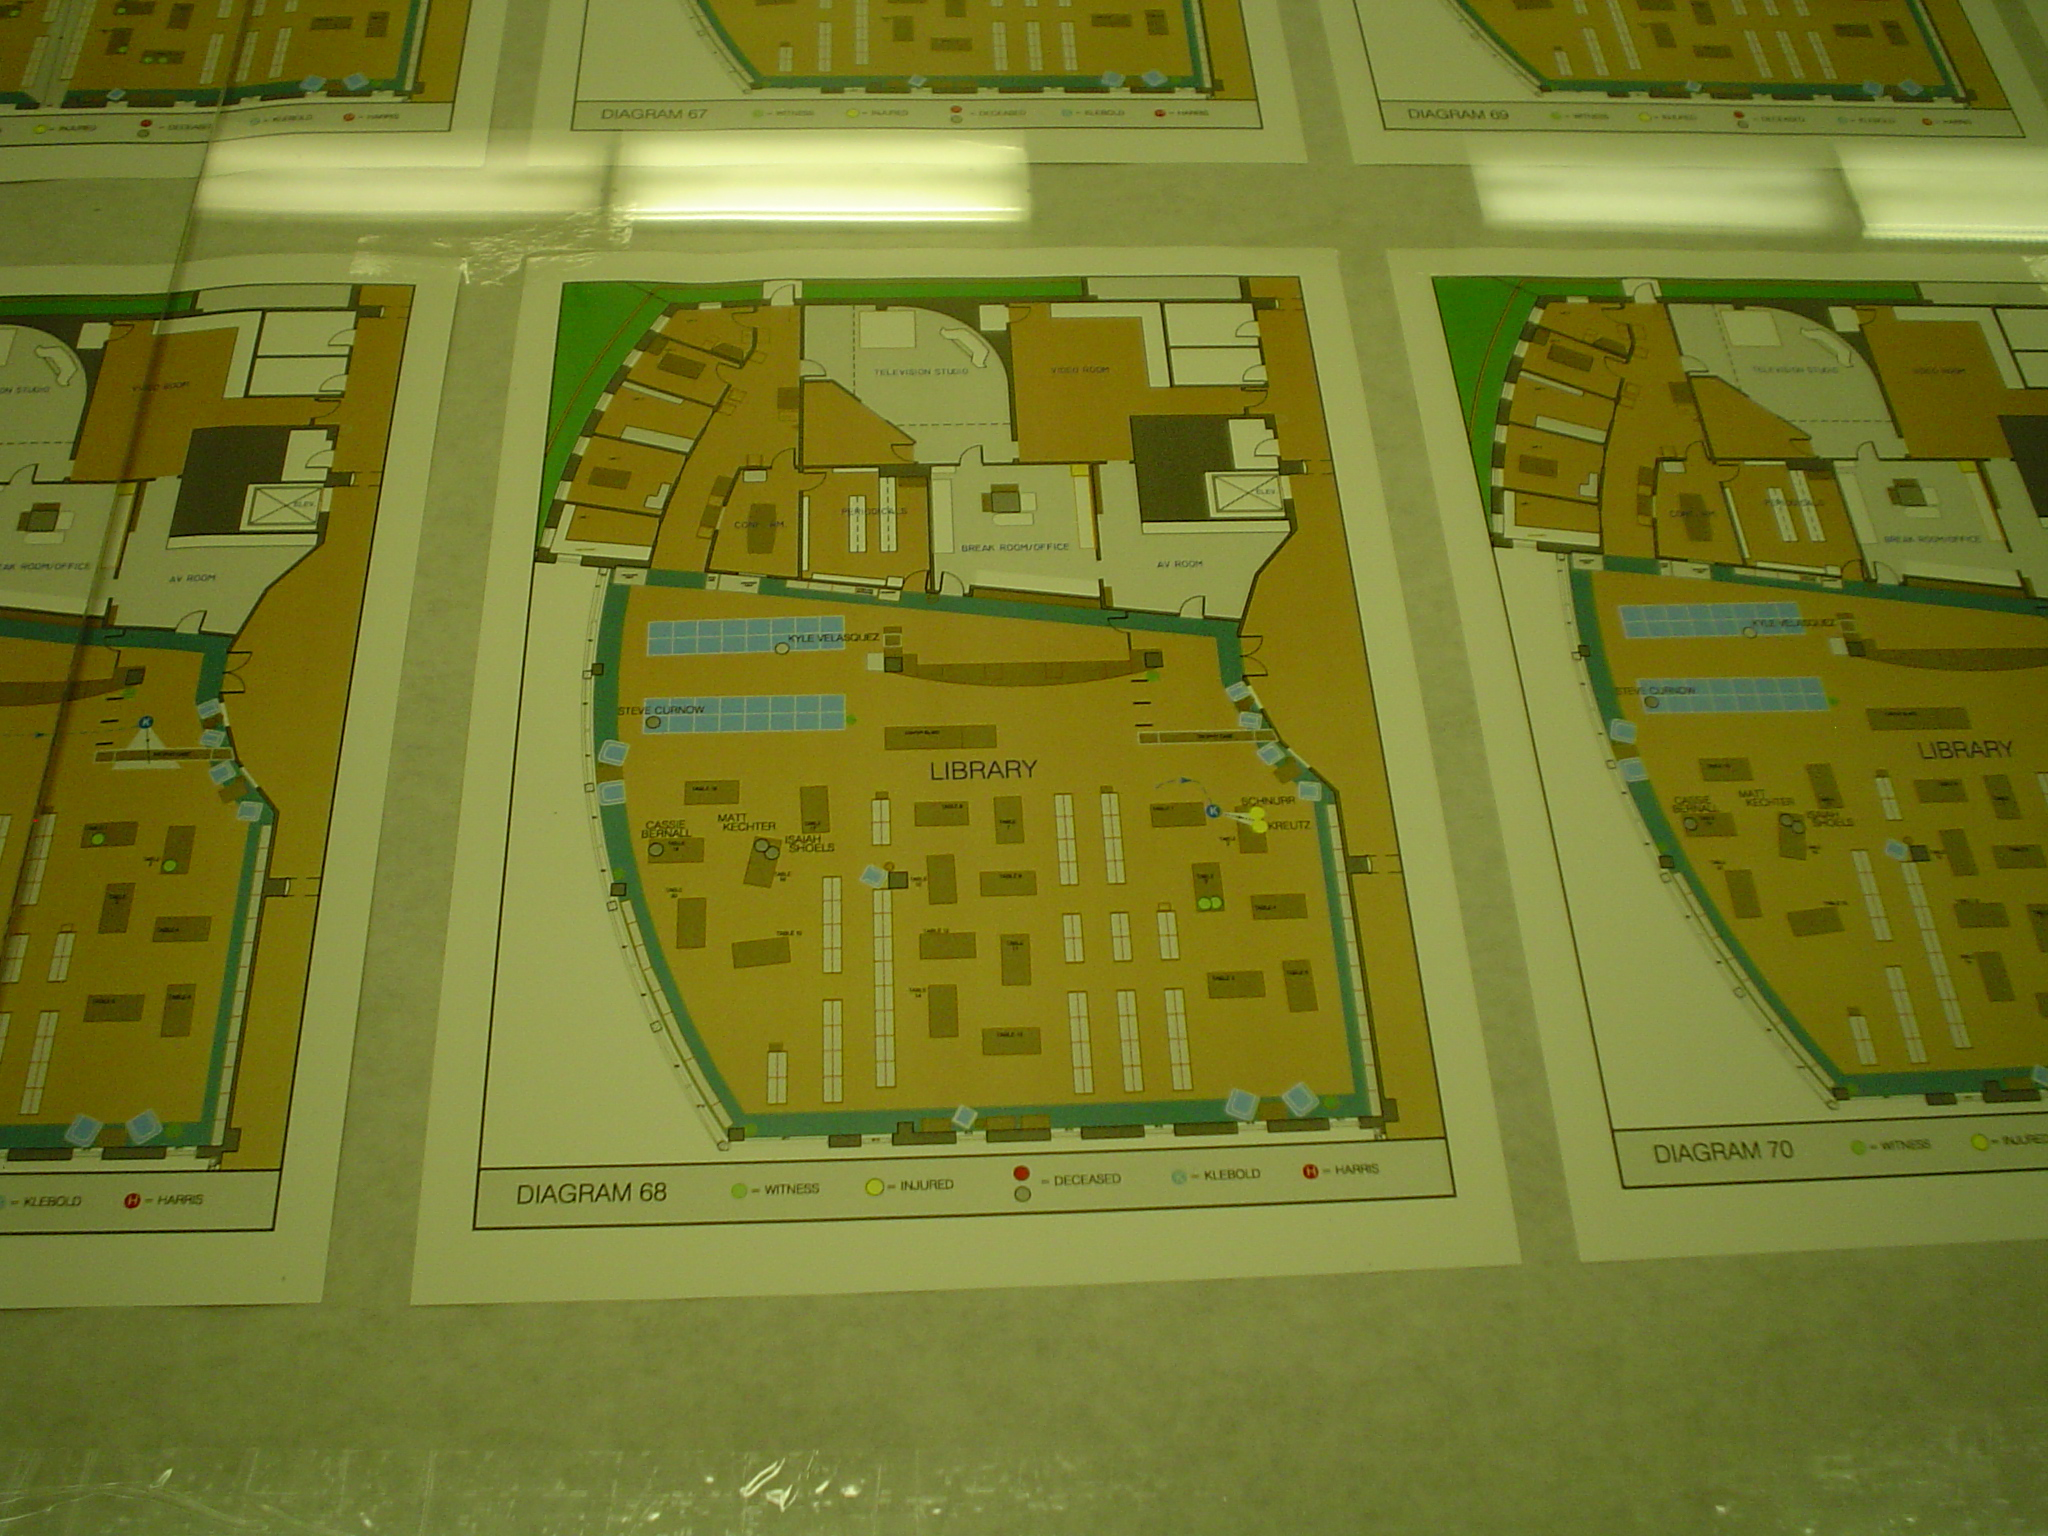 Scale model of library crime scene